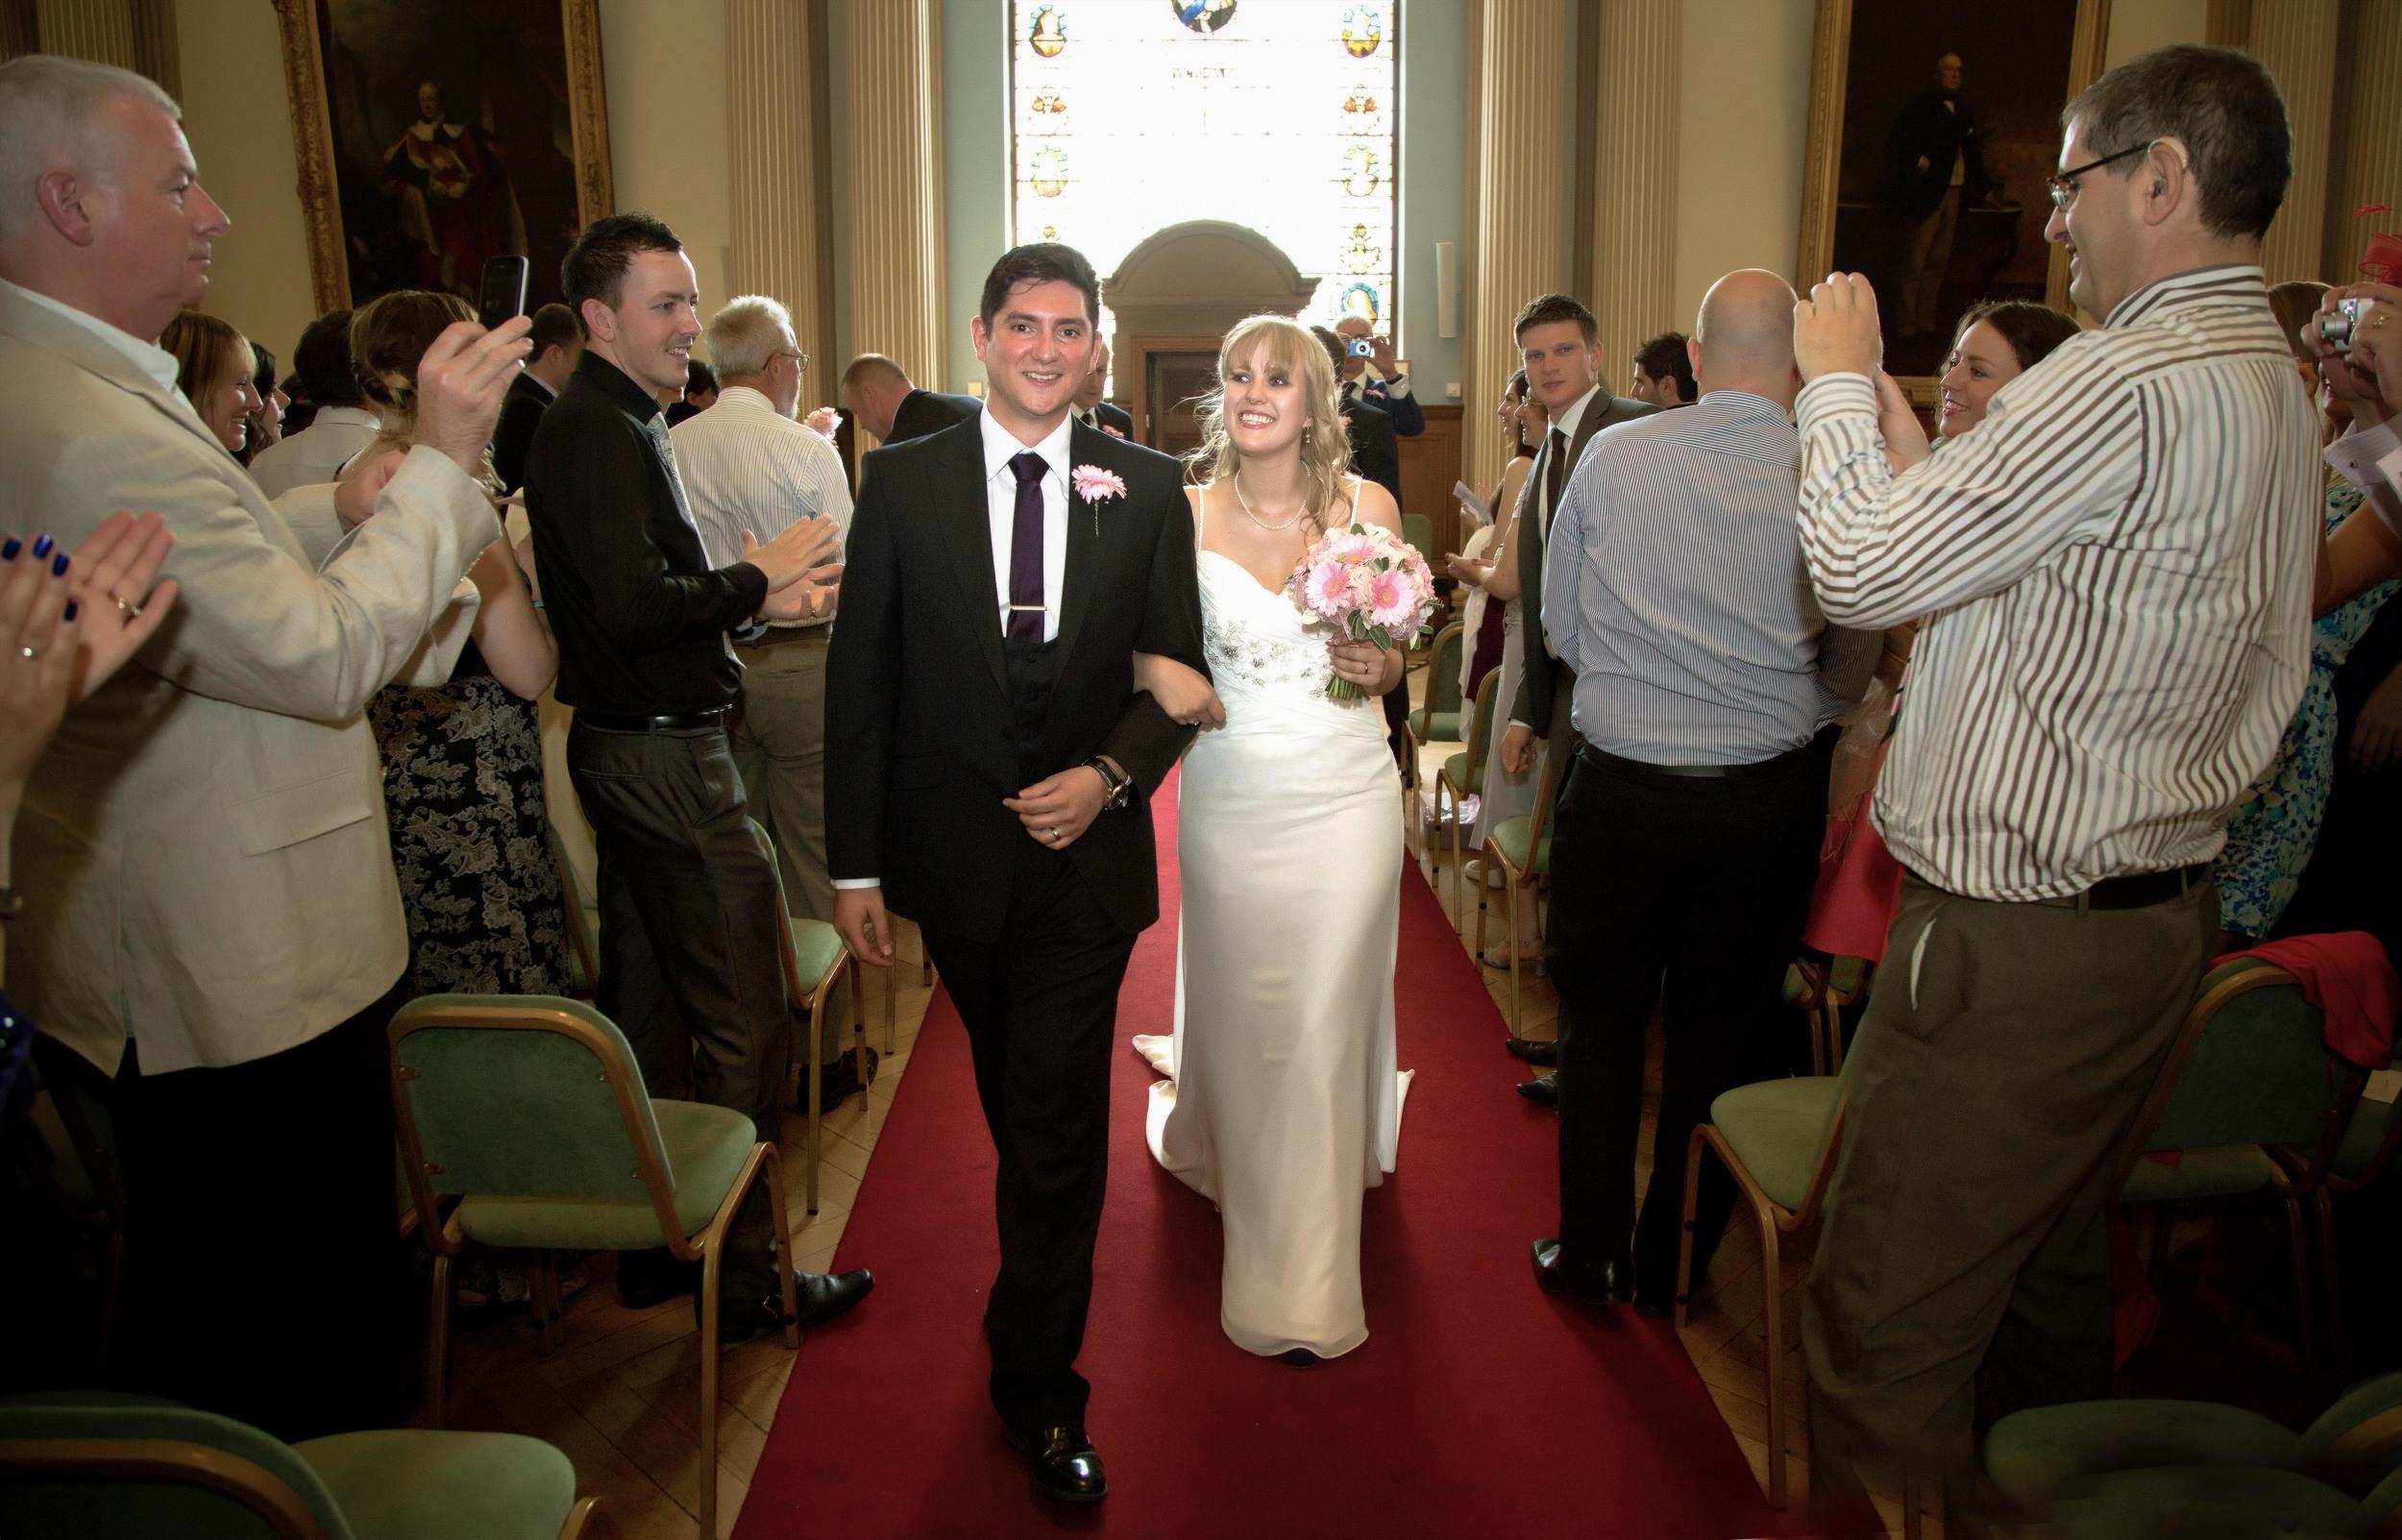 essex-bride-and-groom-london-uk-destination-wedding-photography-Adam-Rowley